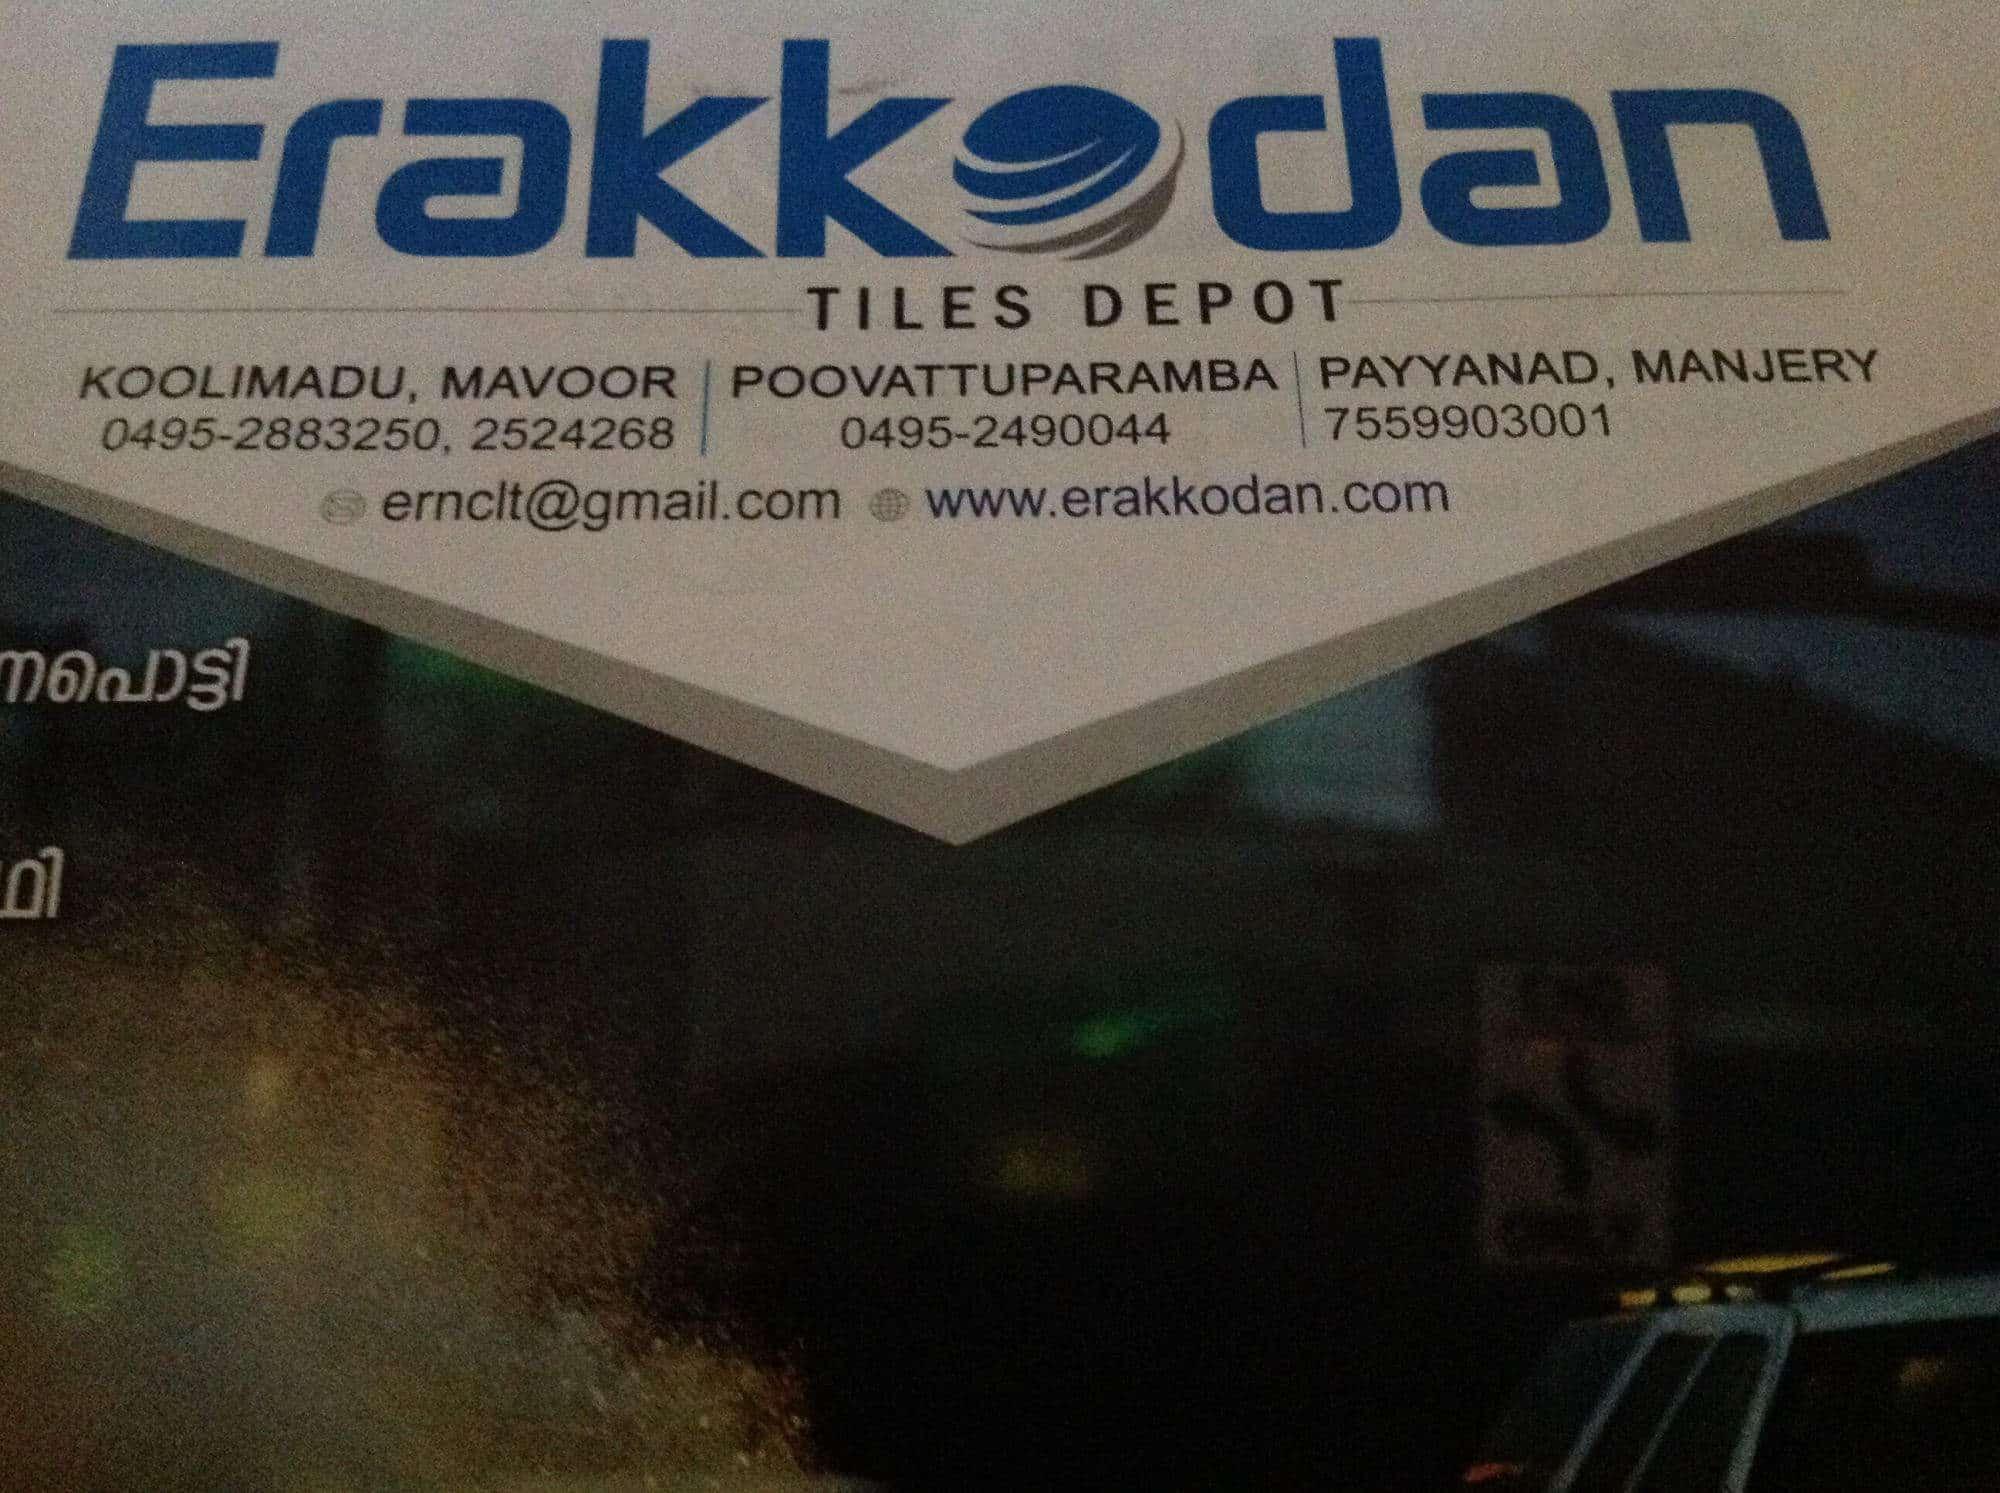 Erakkodan Tiles Depot, Koolimadu - Tile Dealers in Kozhikode - Justdial